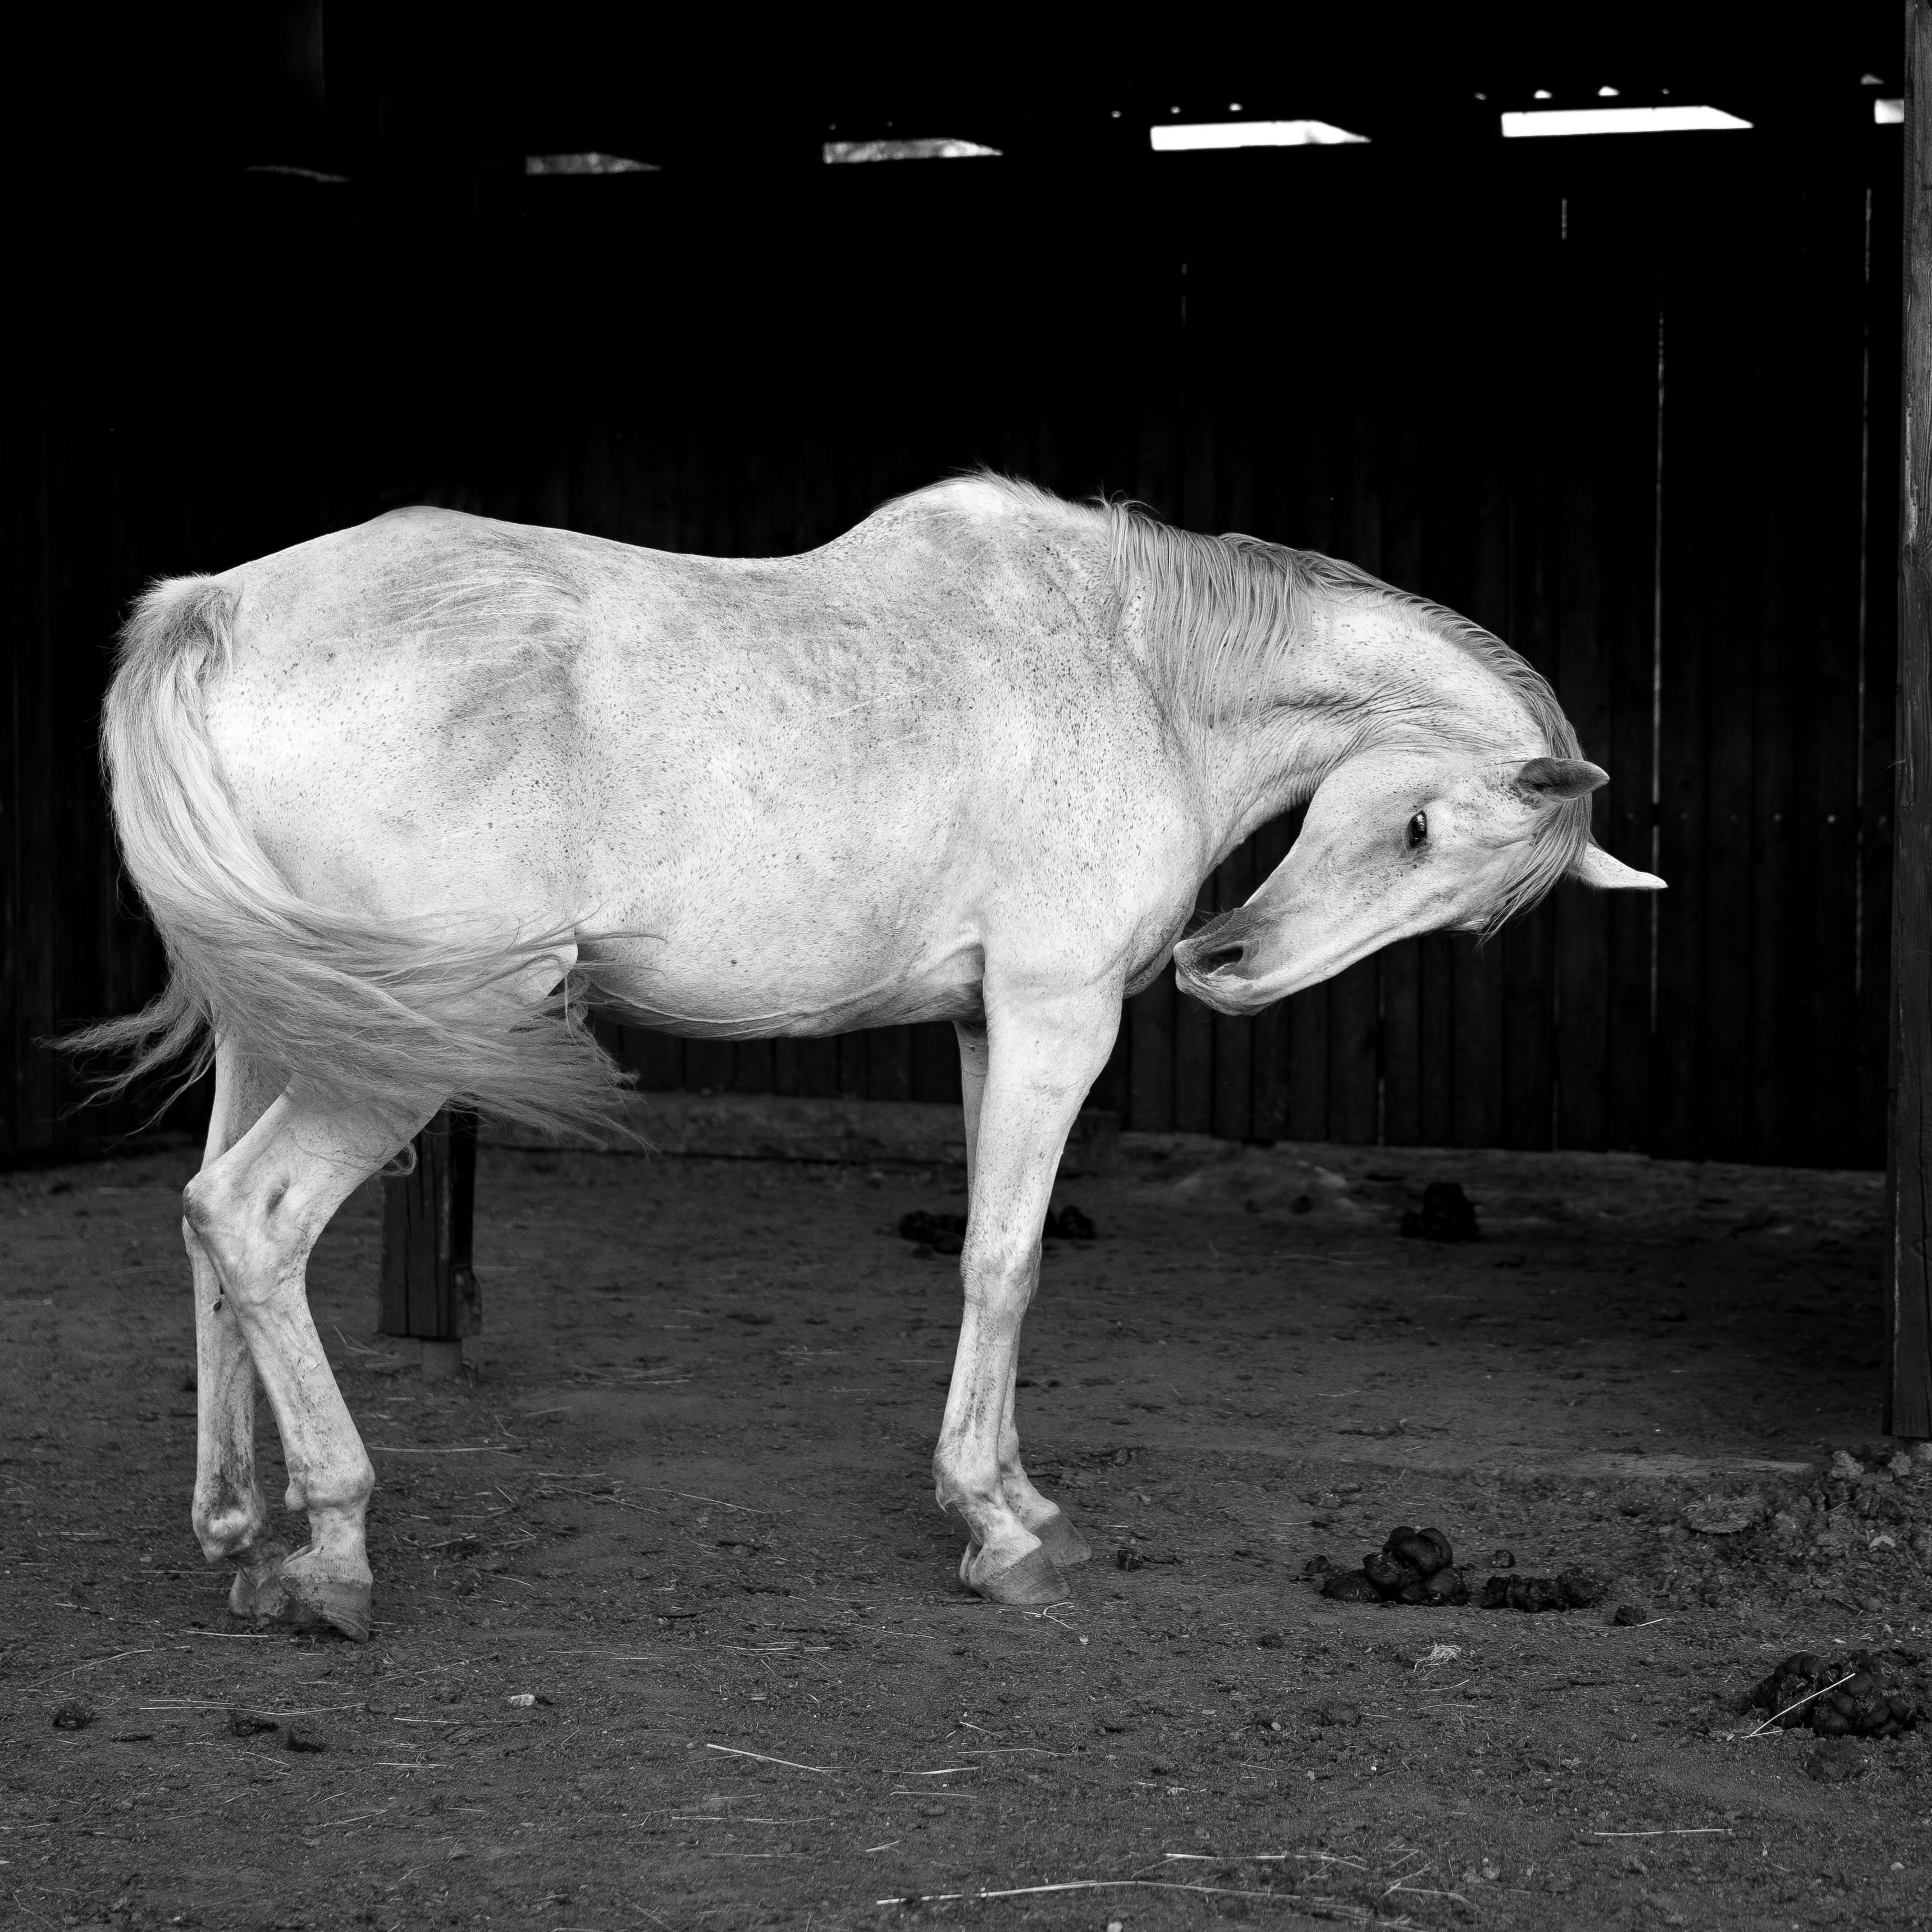 Gambar Hitam Dan Putih Binatang Menyusui Kuda Jantan